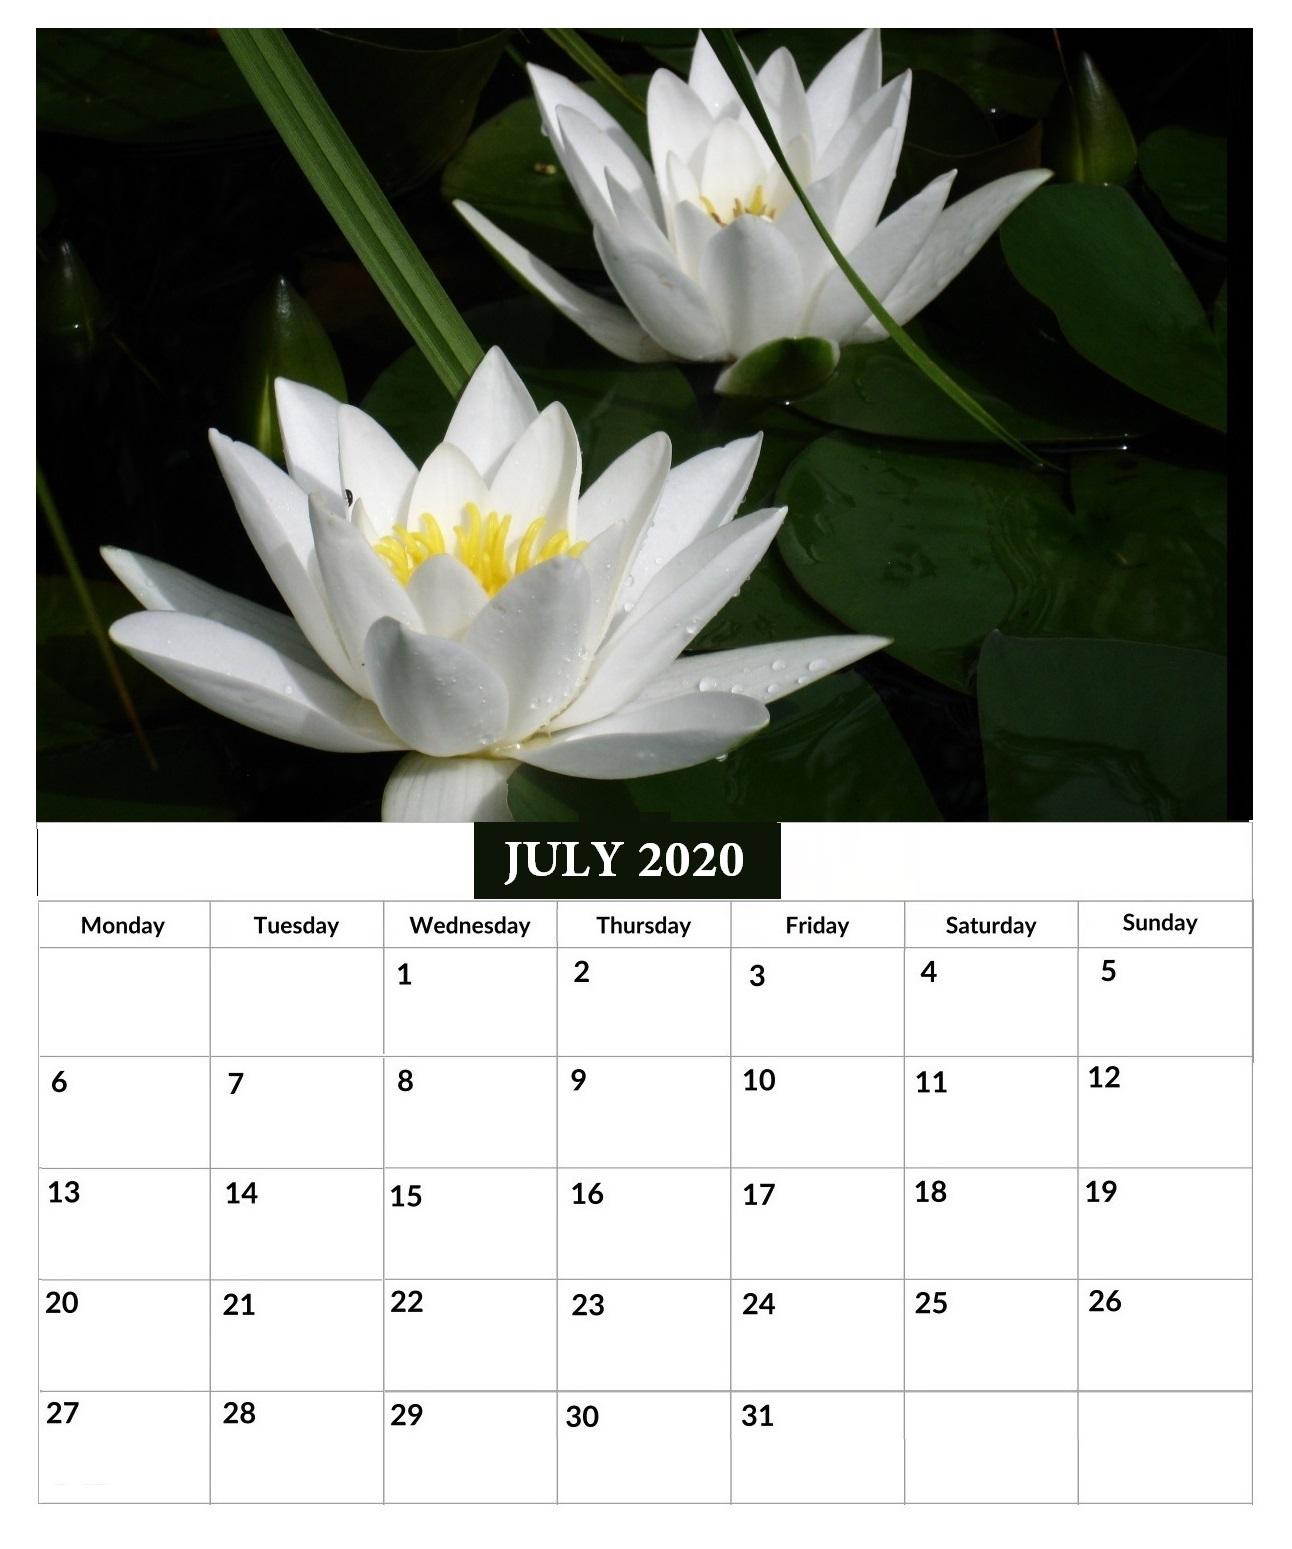 July 2020 Office Wall Calendar